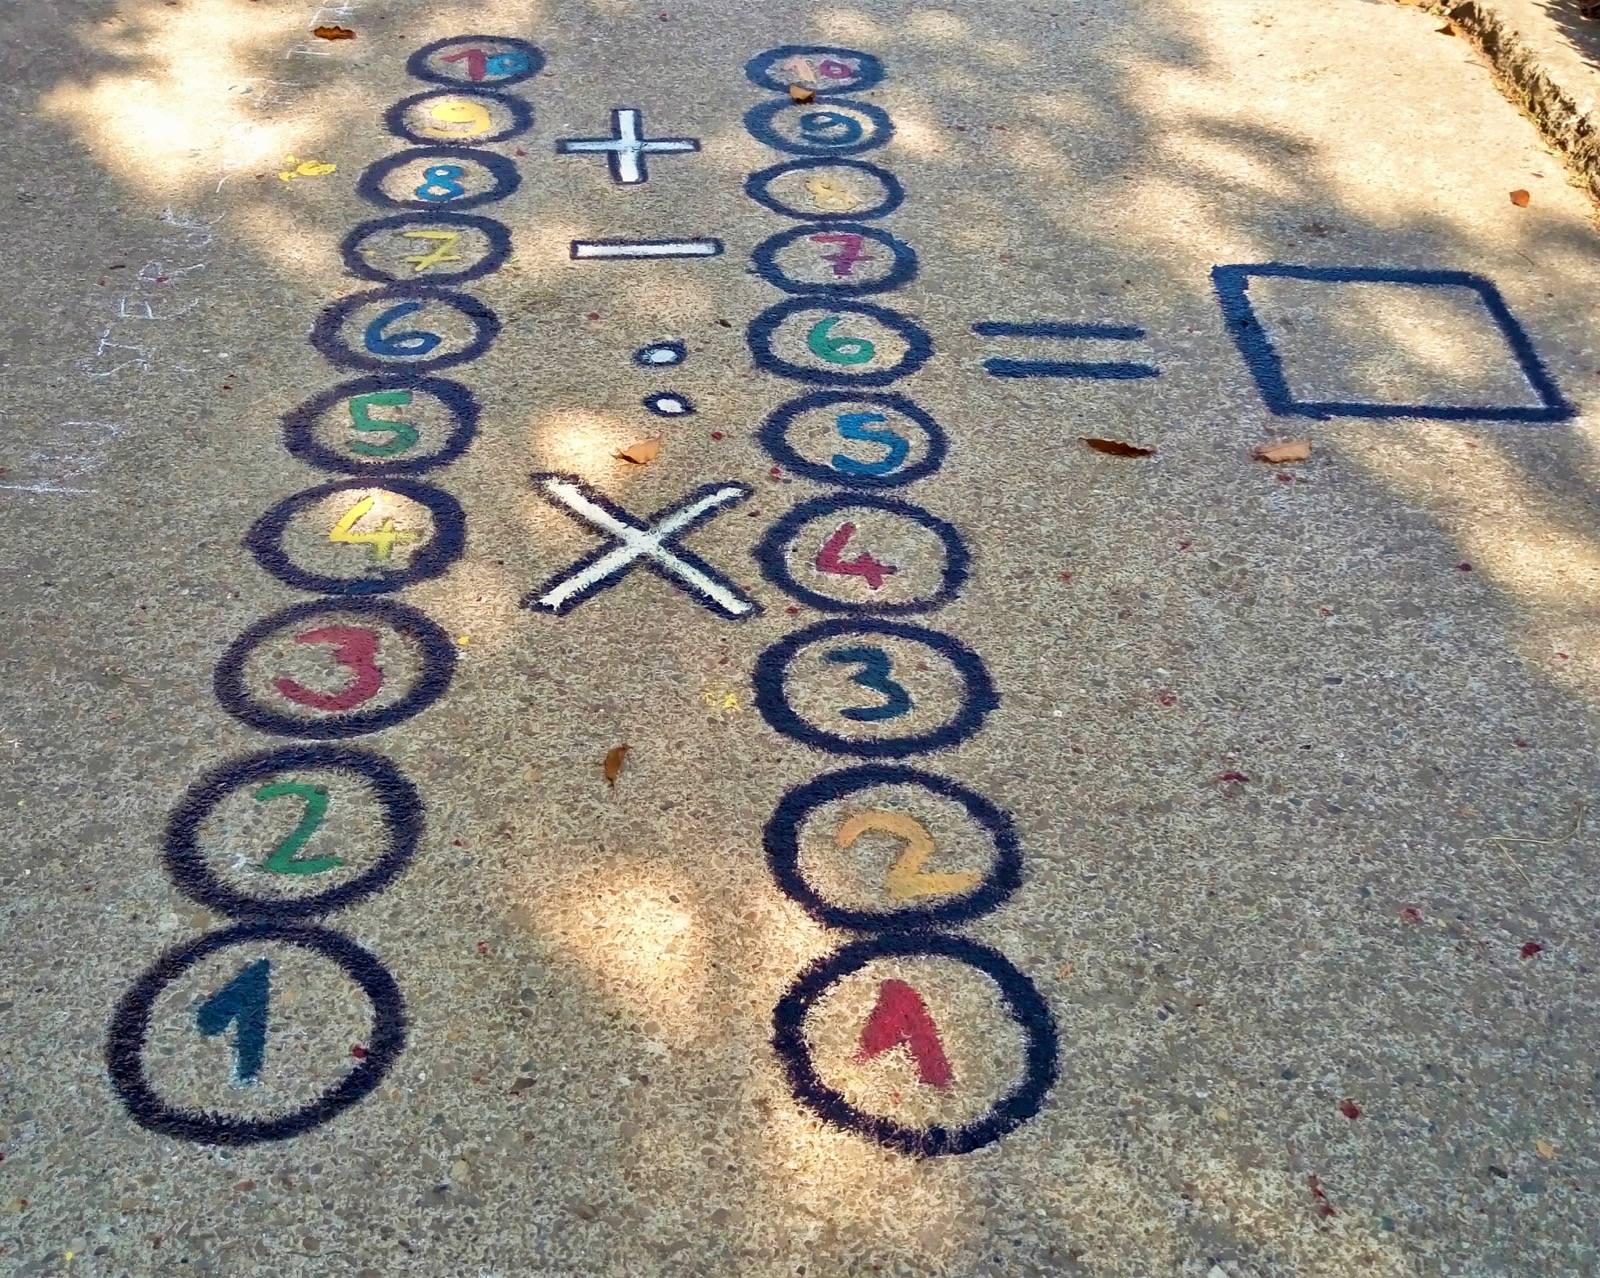 desene permanente pe asfalt scoala moinesti 2